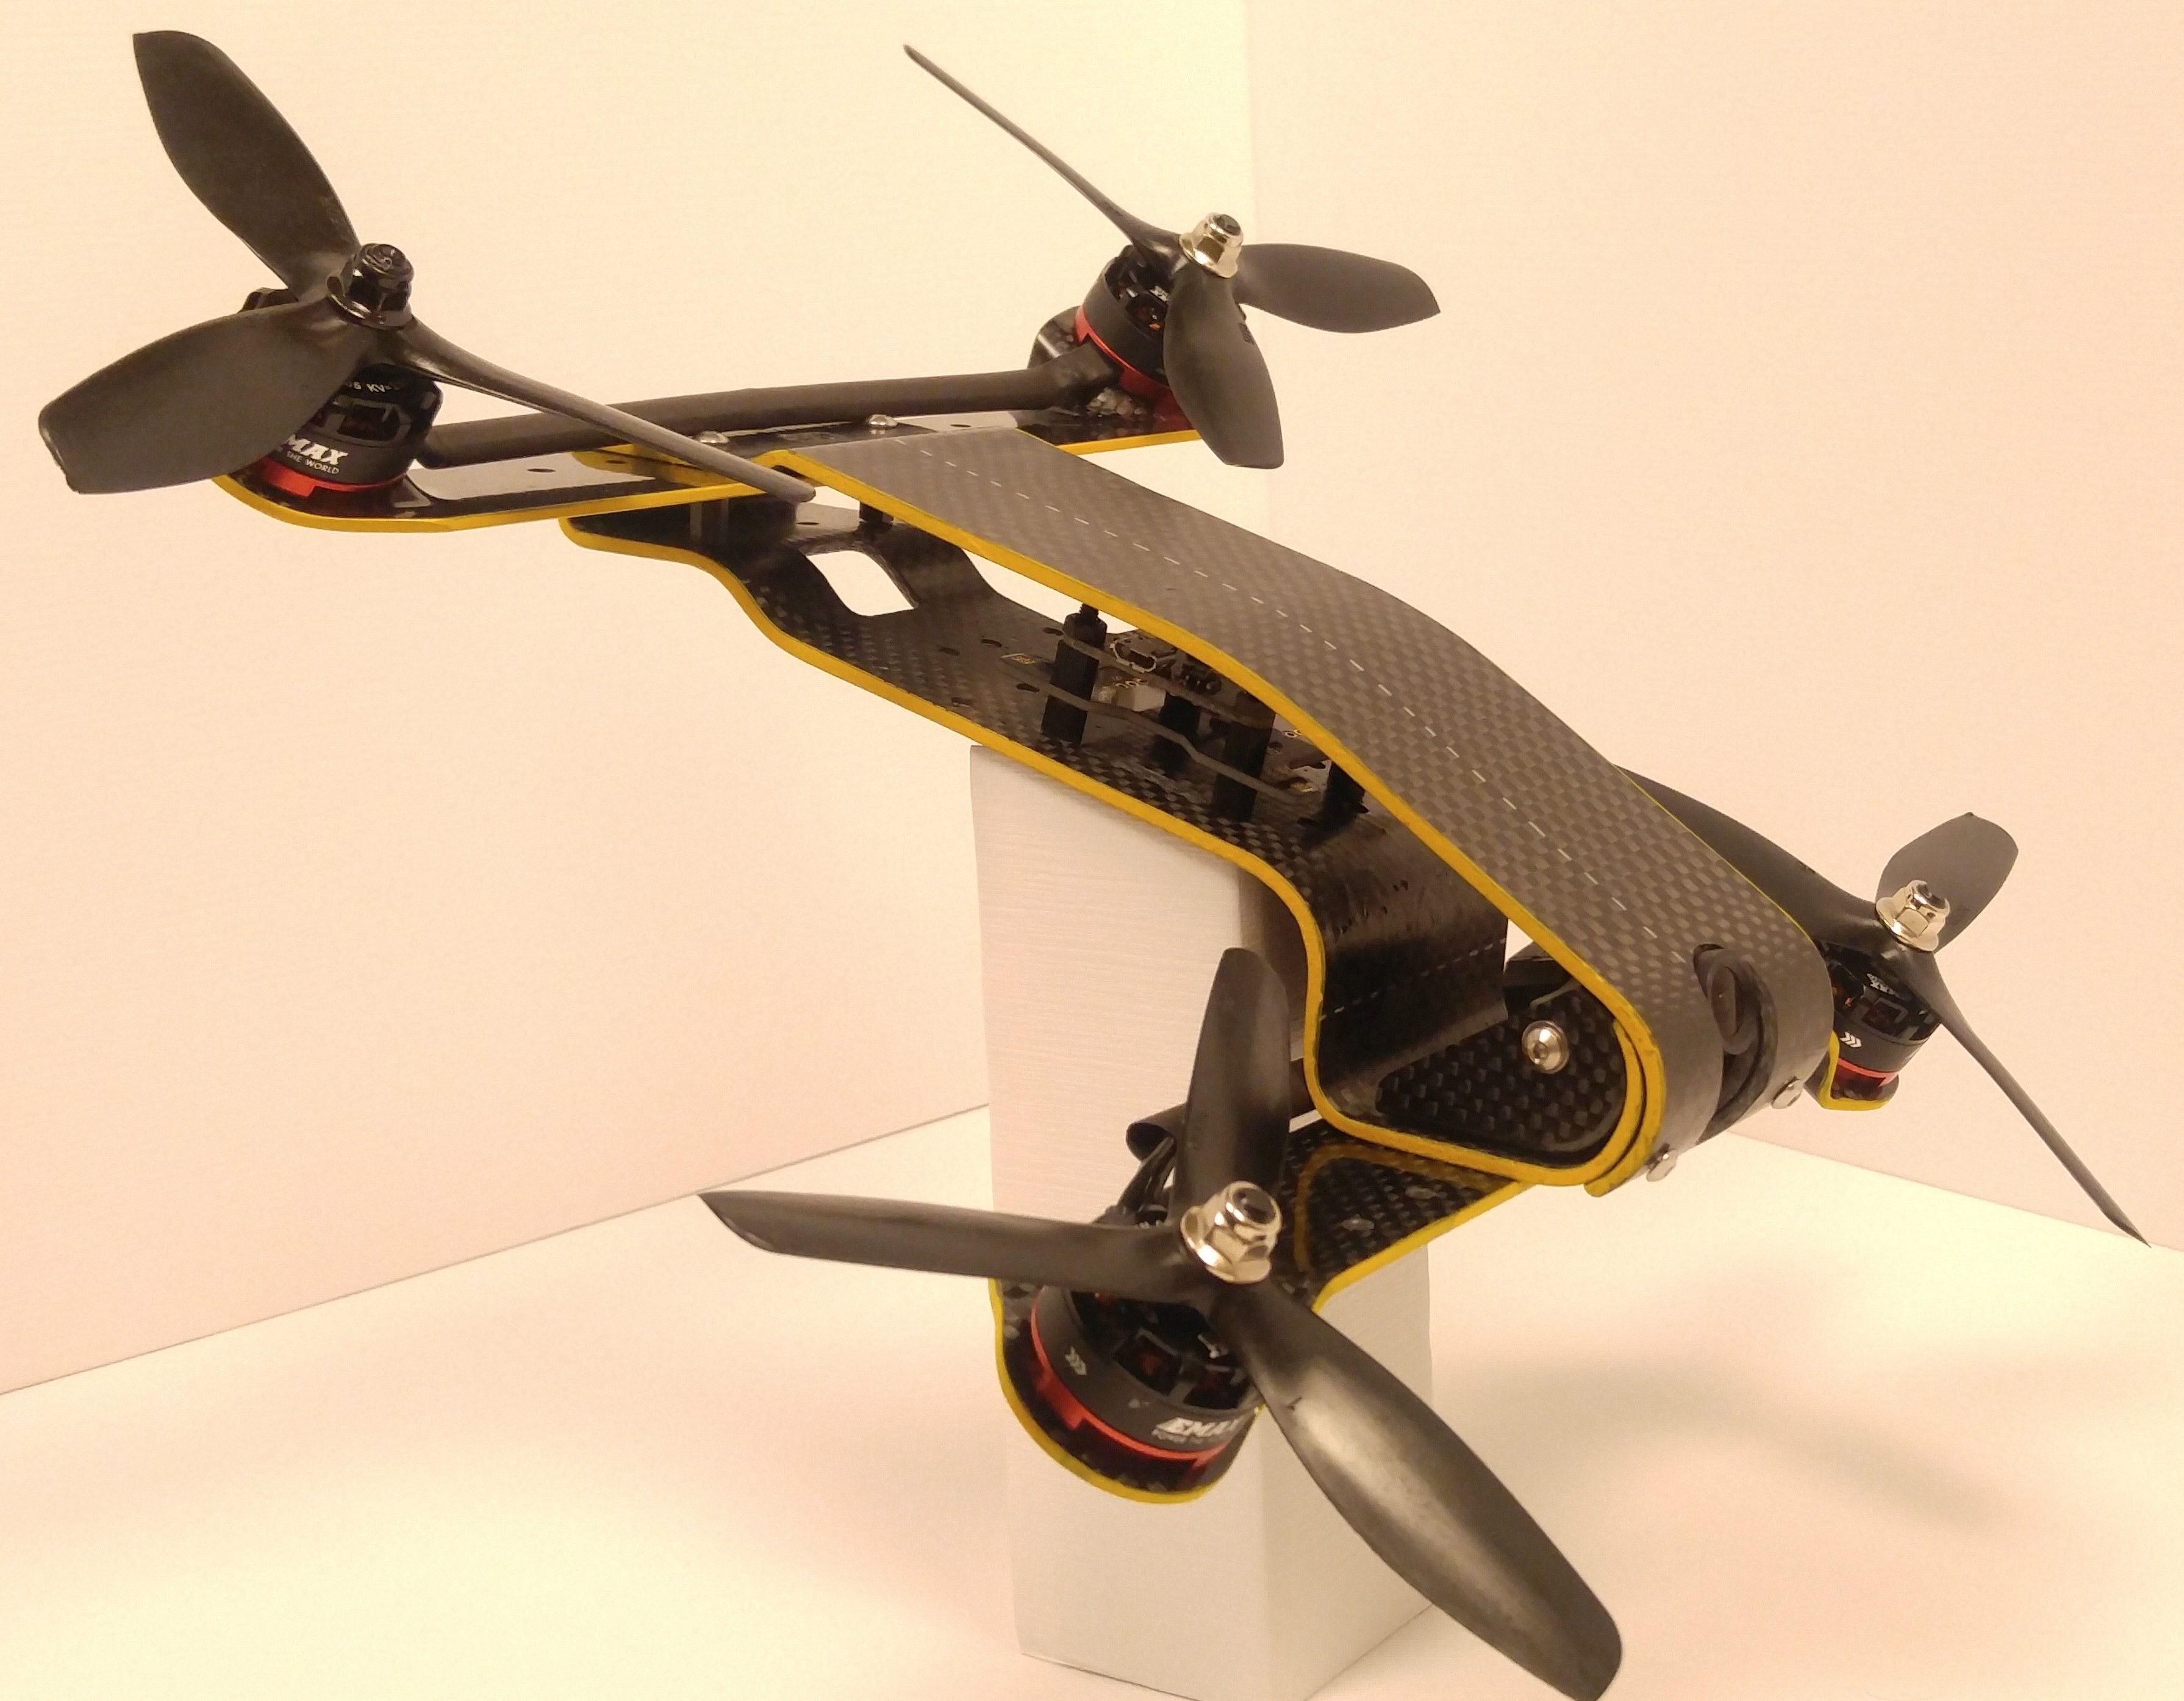 Performance Technology: Carbon Hornet 250 High Performance Racing Drone Revolution